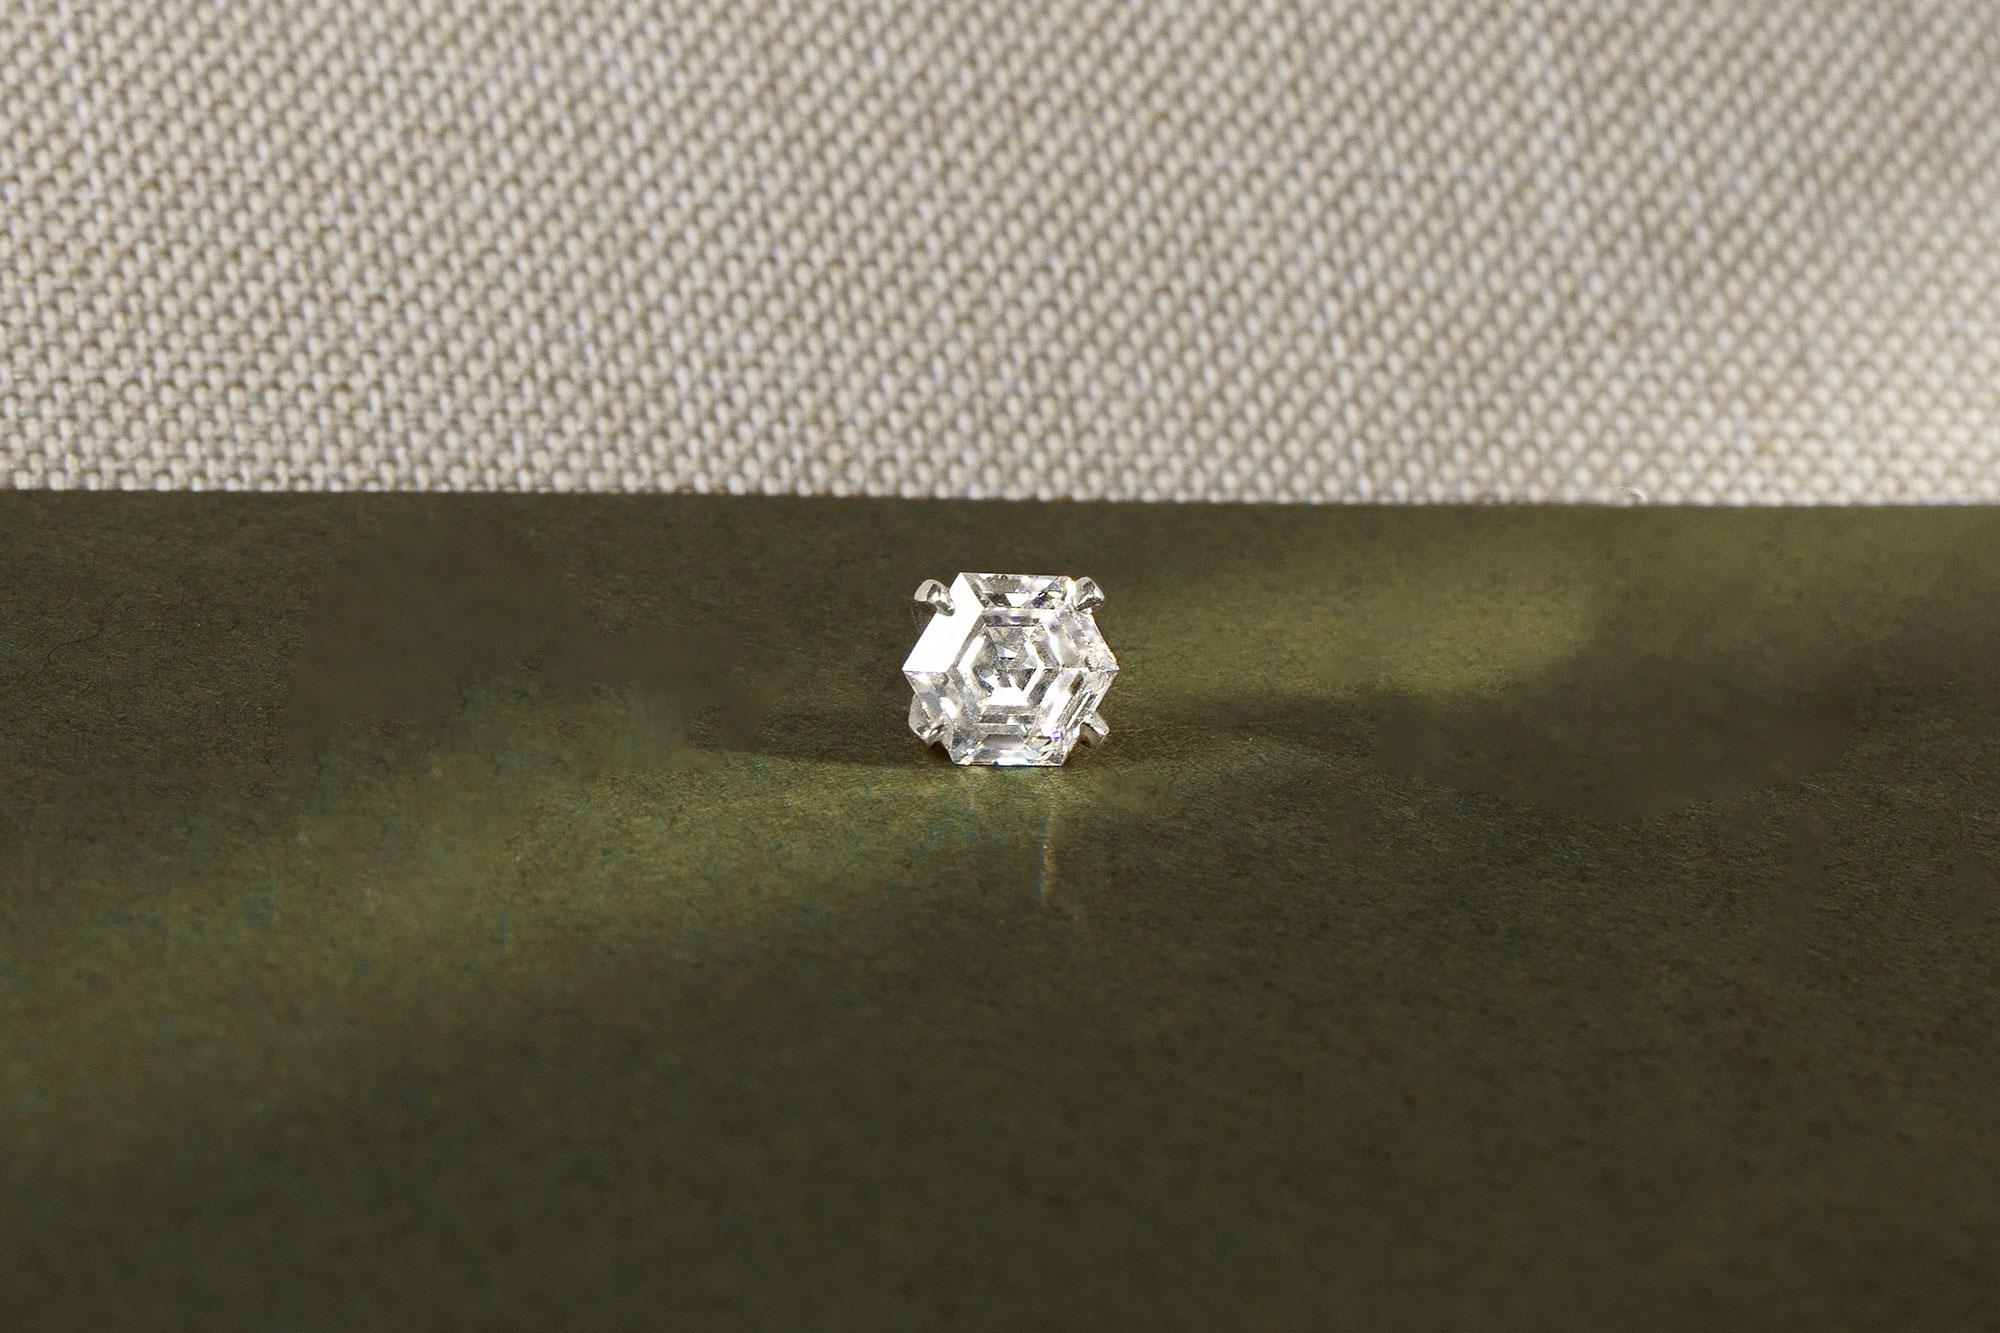 White gold iconic shapes hexagon stud